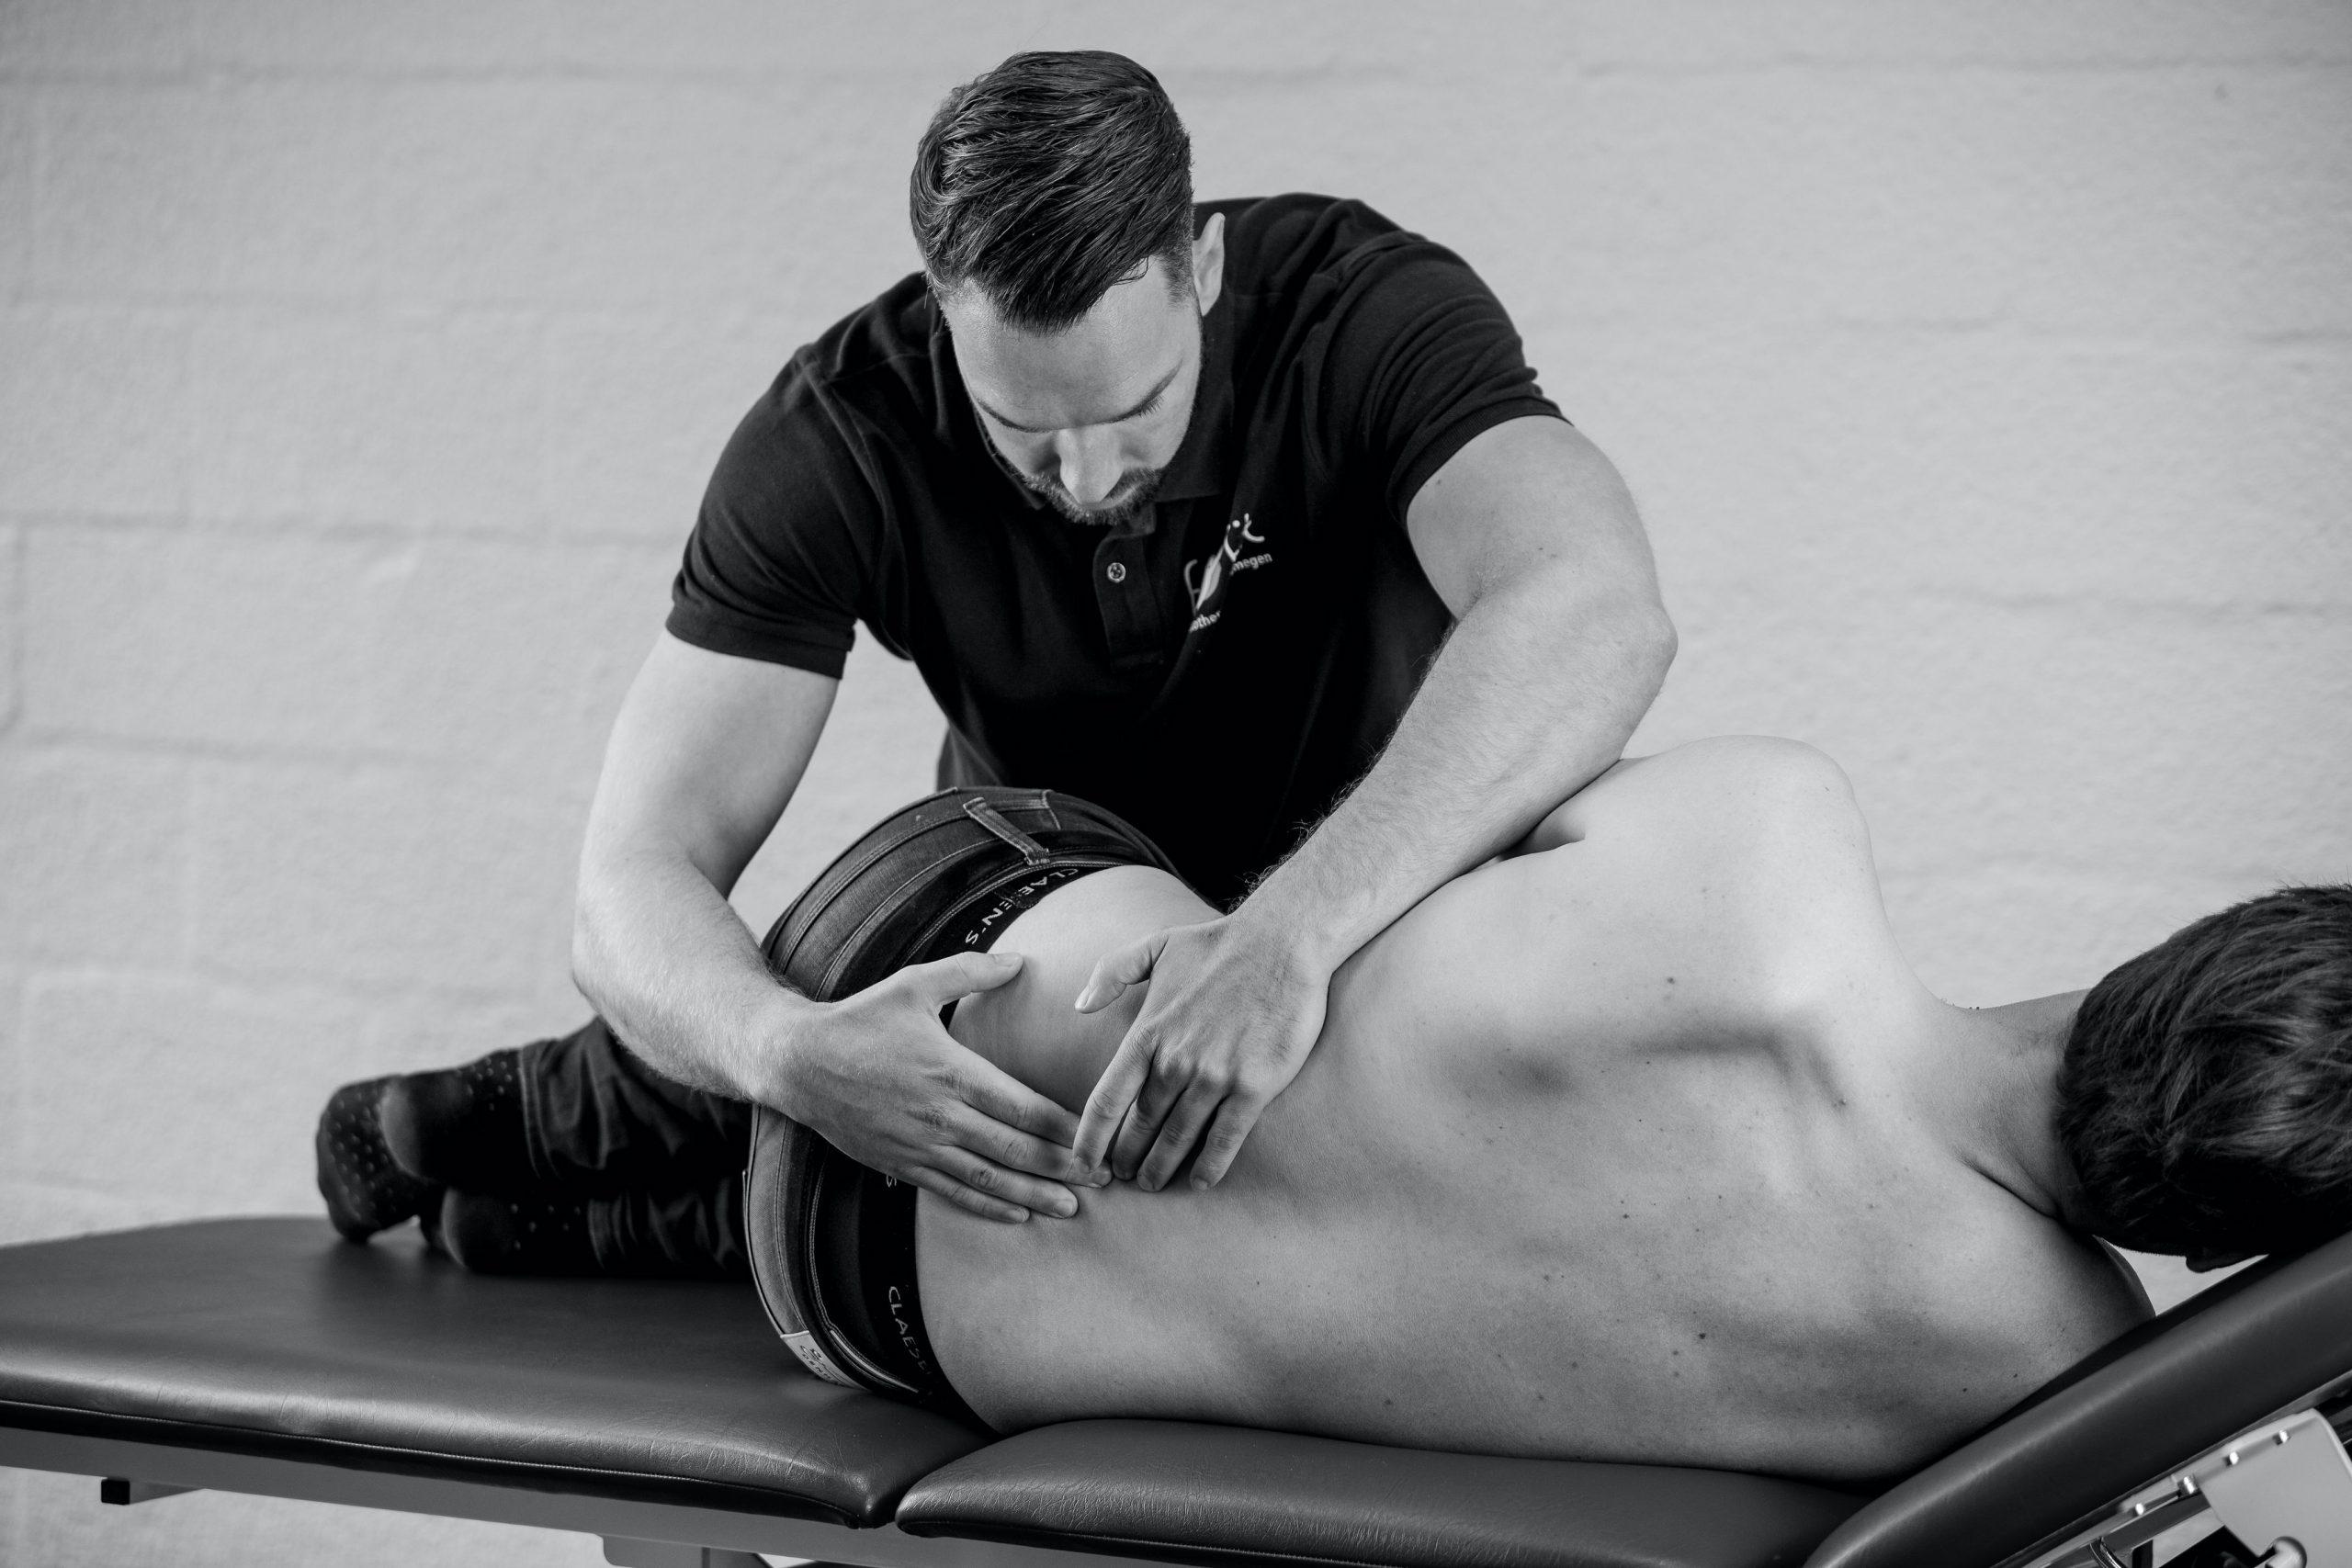 fysiotherapie bij blokkades (Manuele therapie)